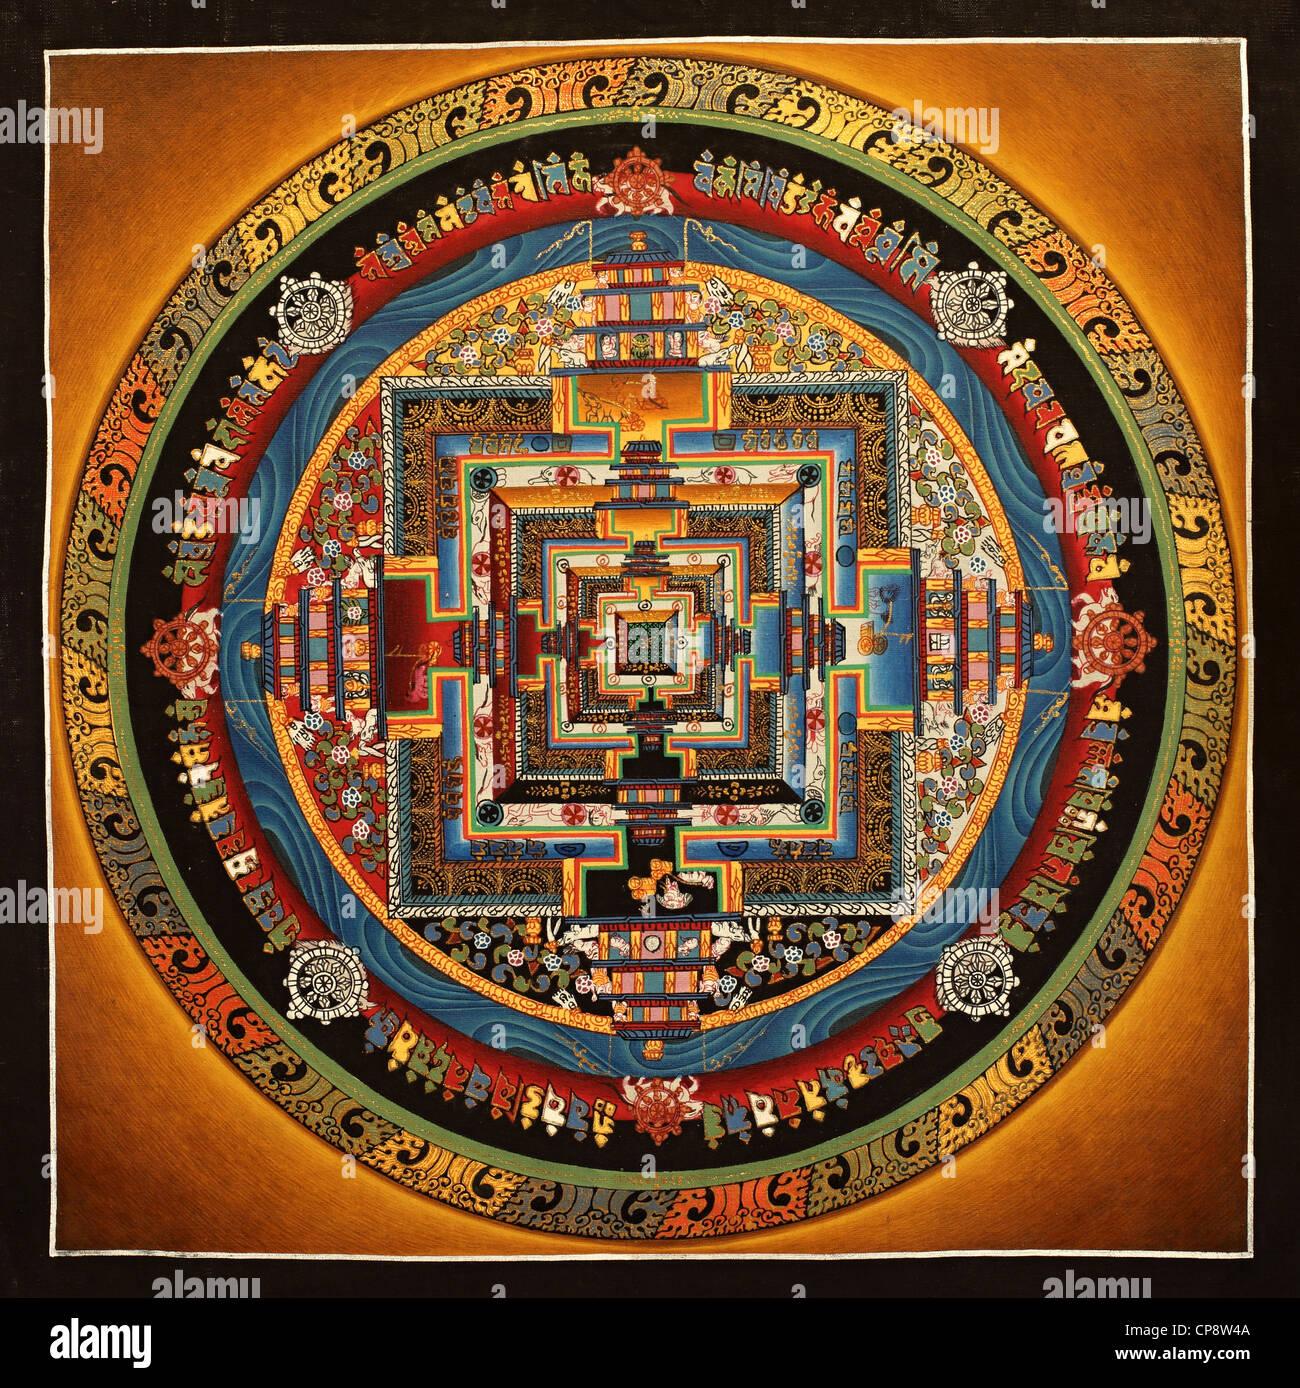 Mandala - Buddhist painting Thangka from Nepal - Stock Image